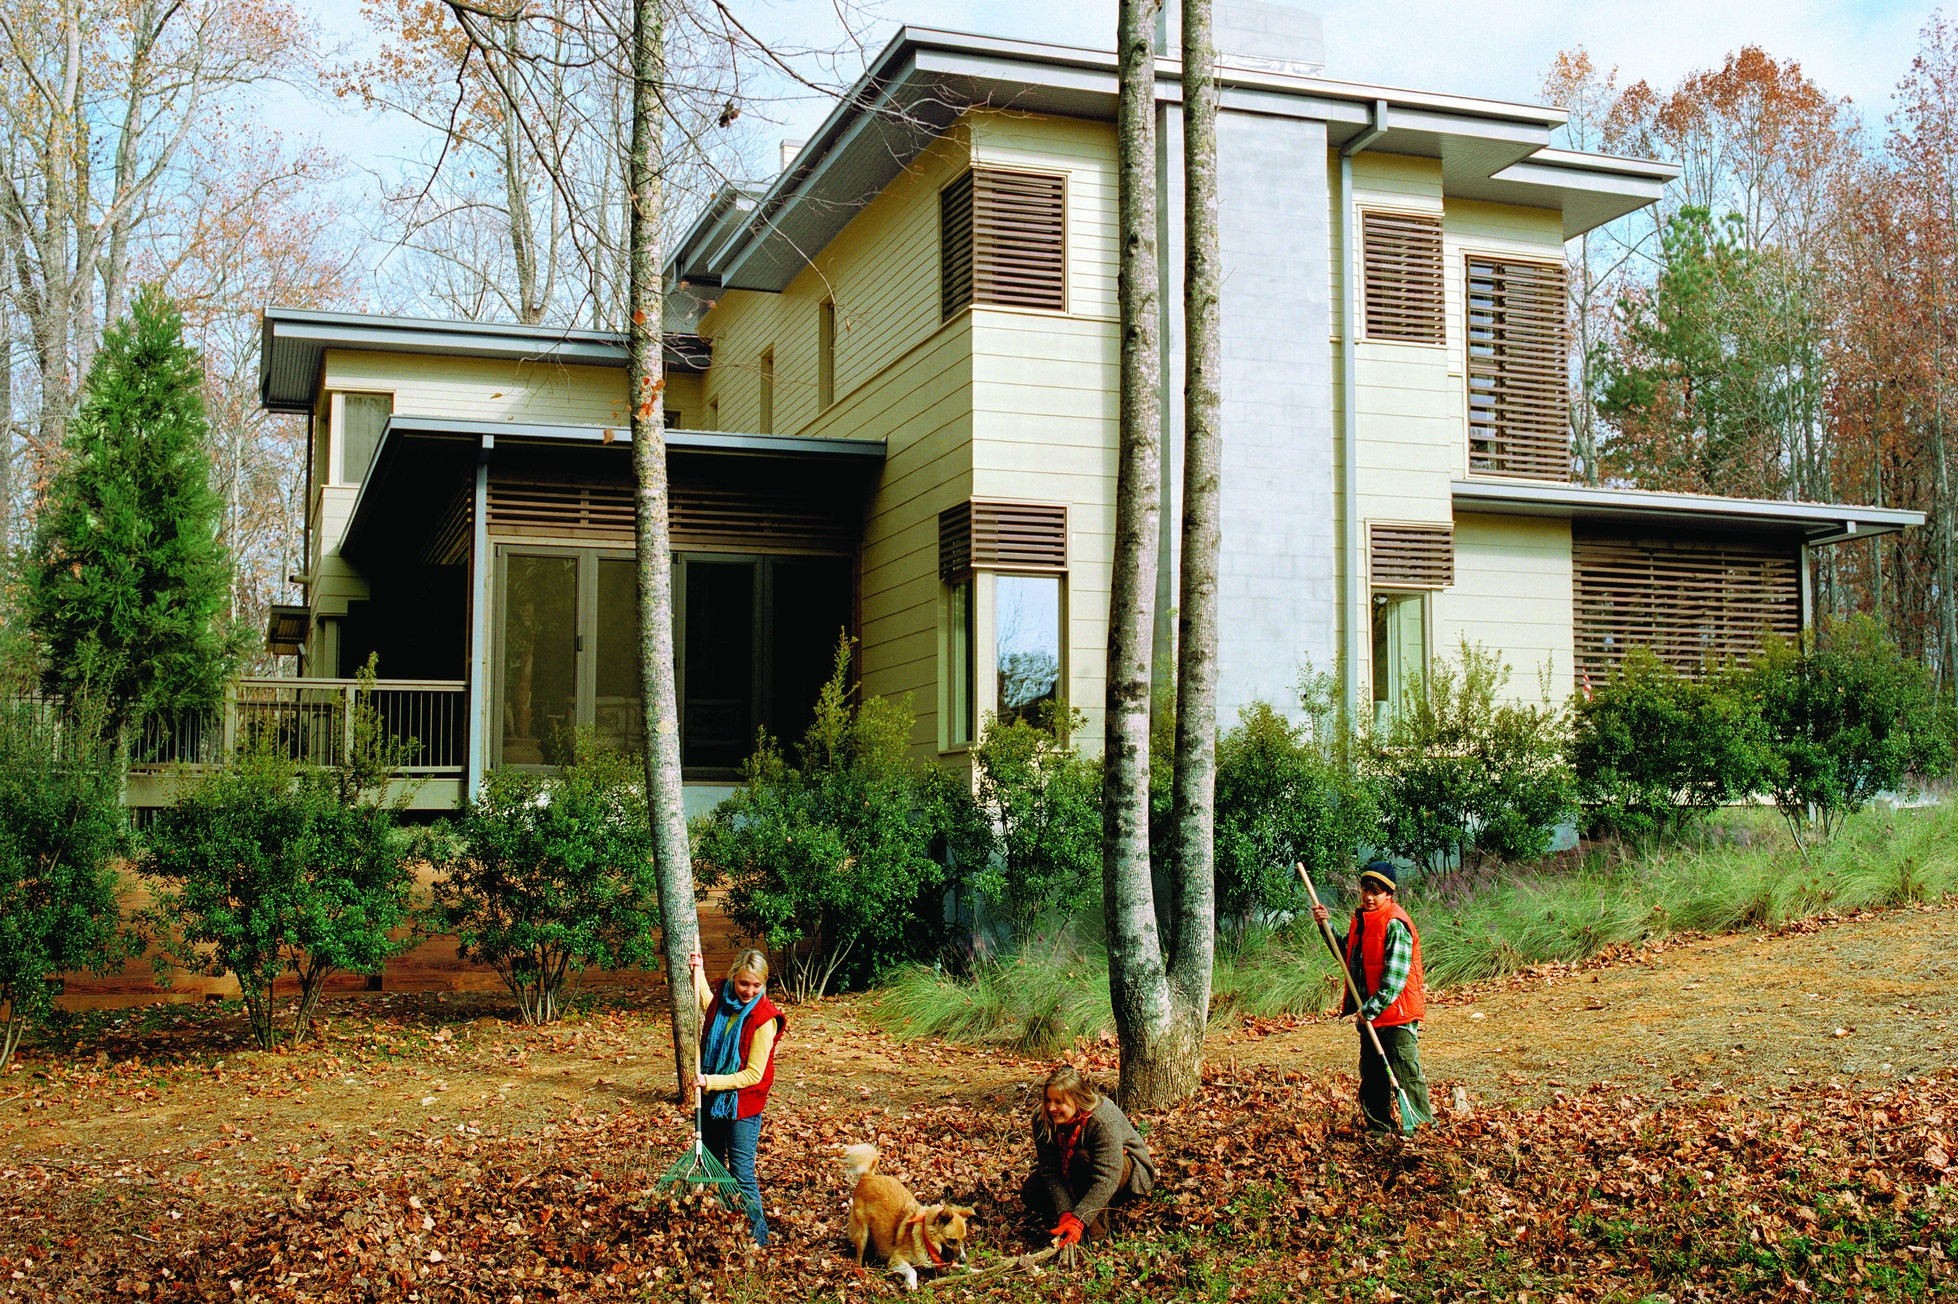 Family raking autumn leaves